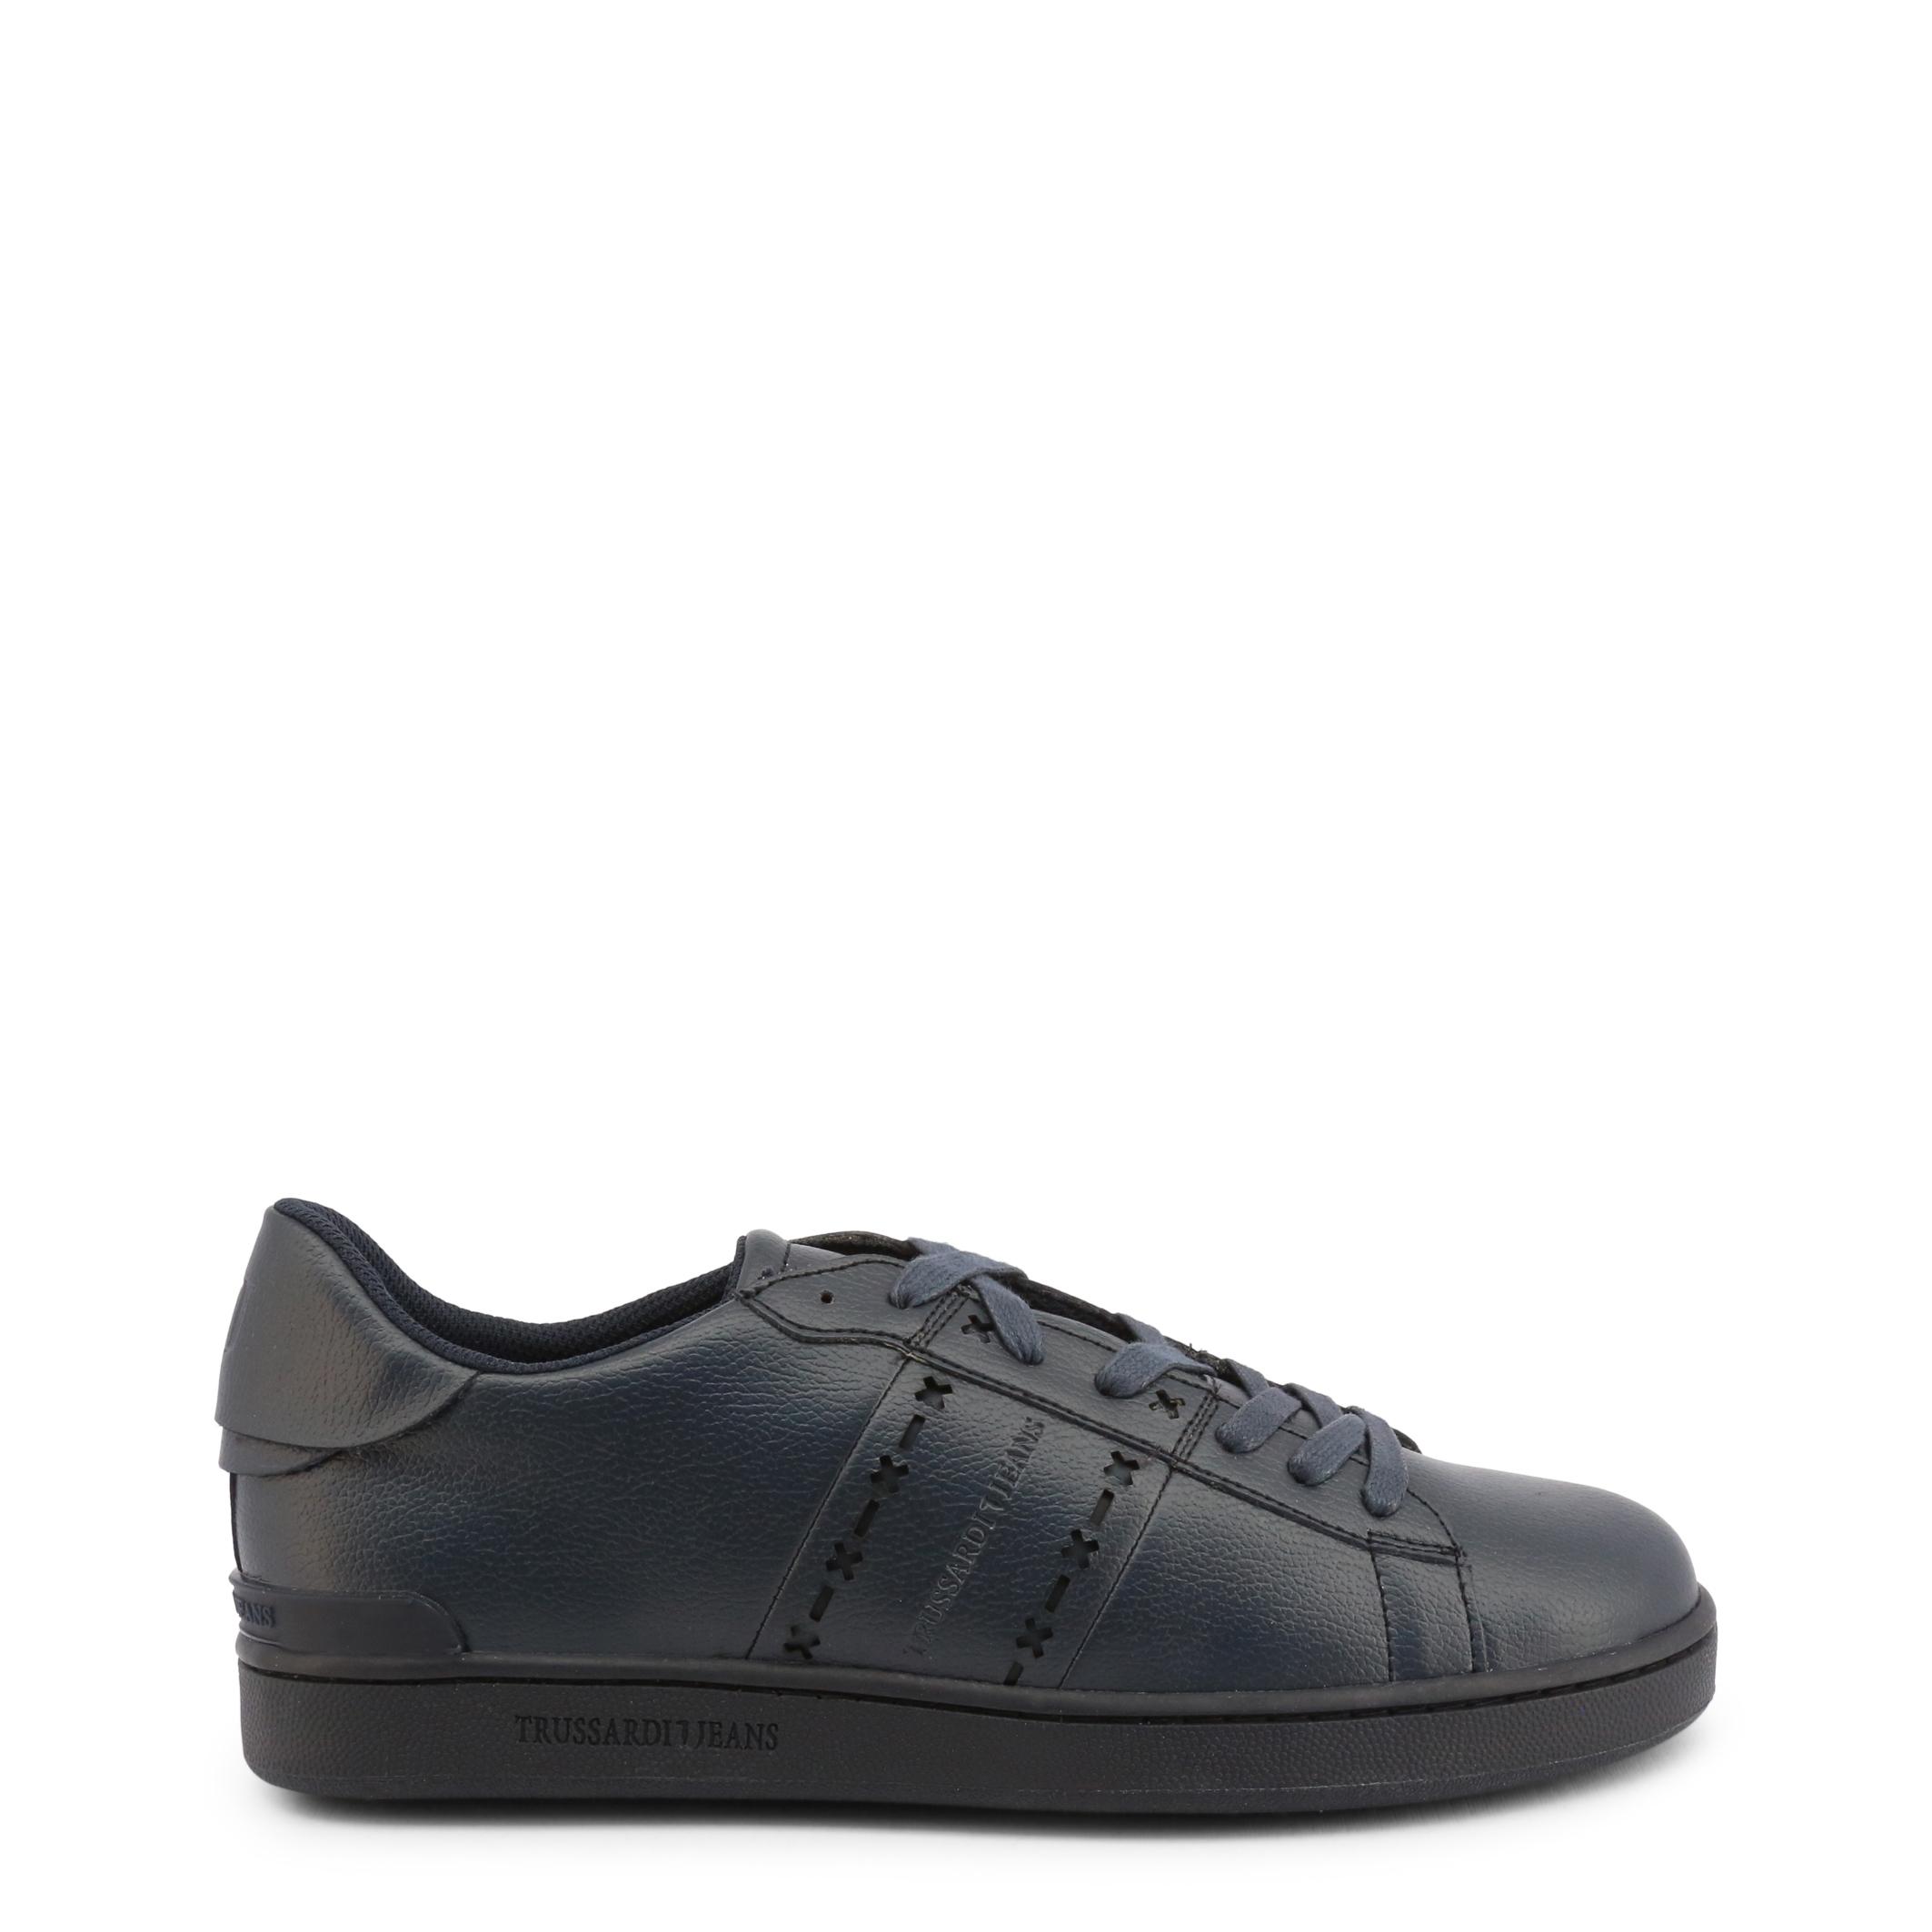 Pantofi sport Trussardi 77A00005 Albastru